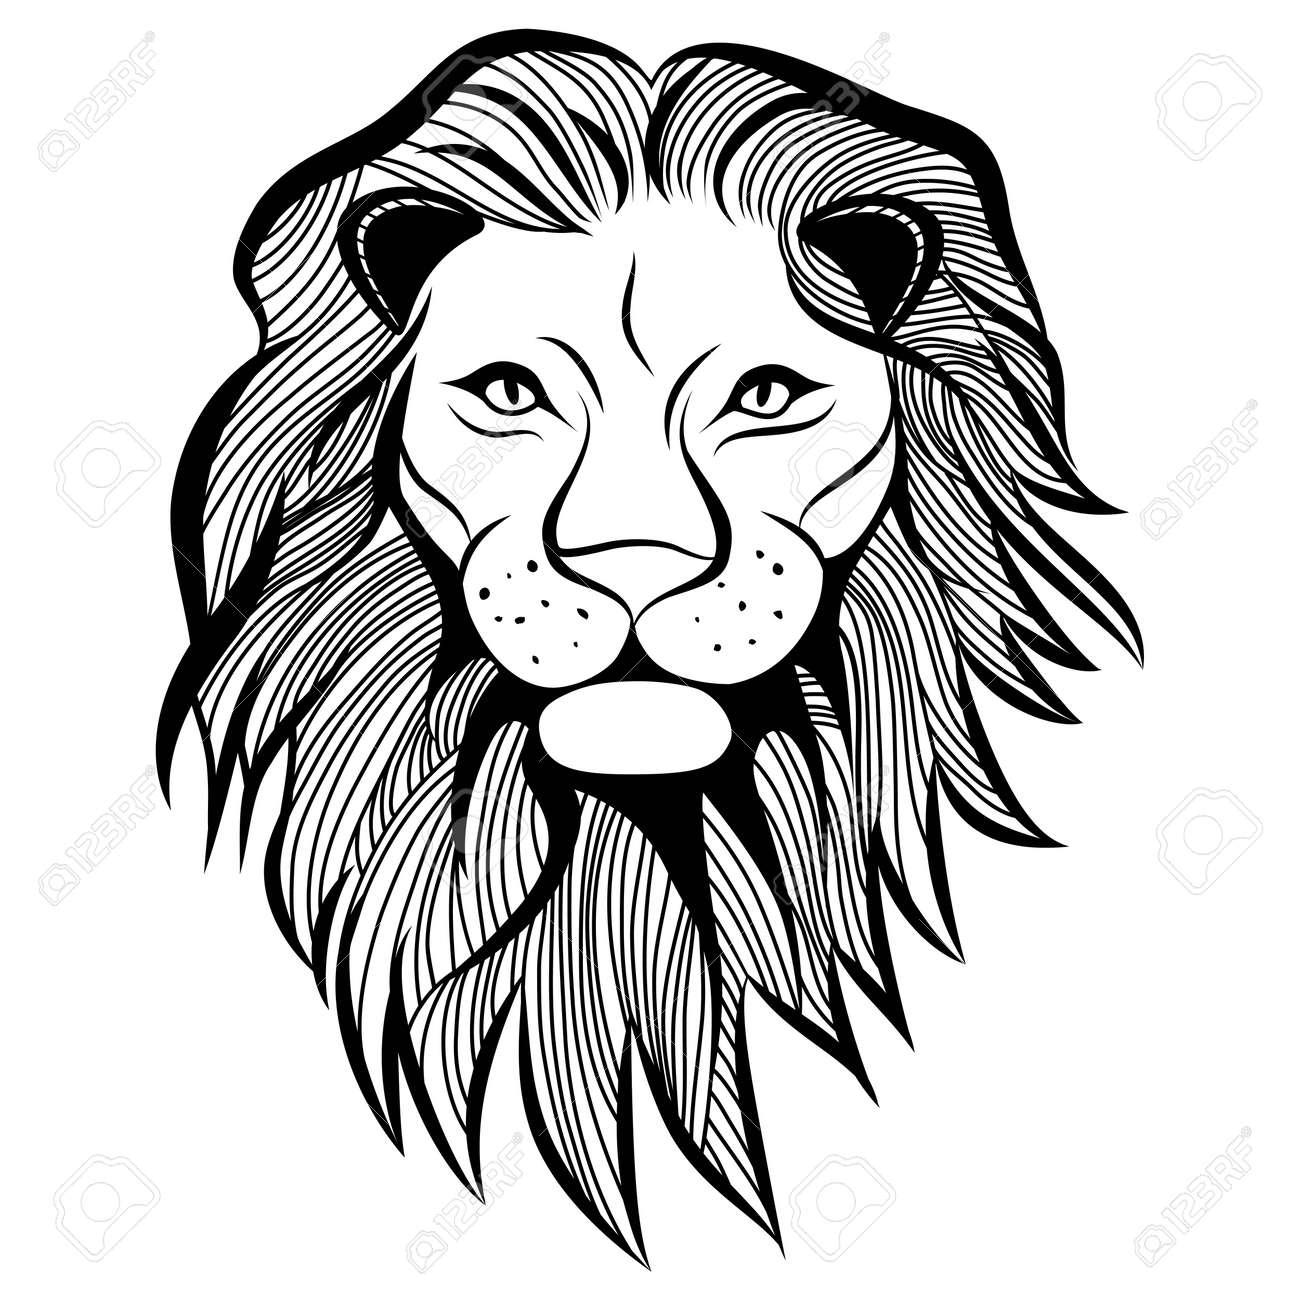 Lion Head Animal Illustration For T Shirt Sketch Tattoo Design